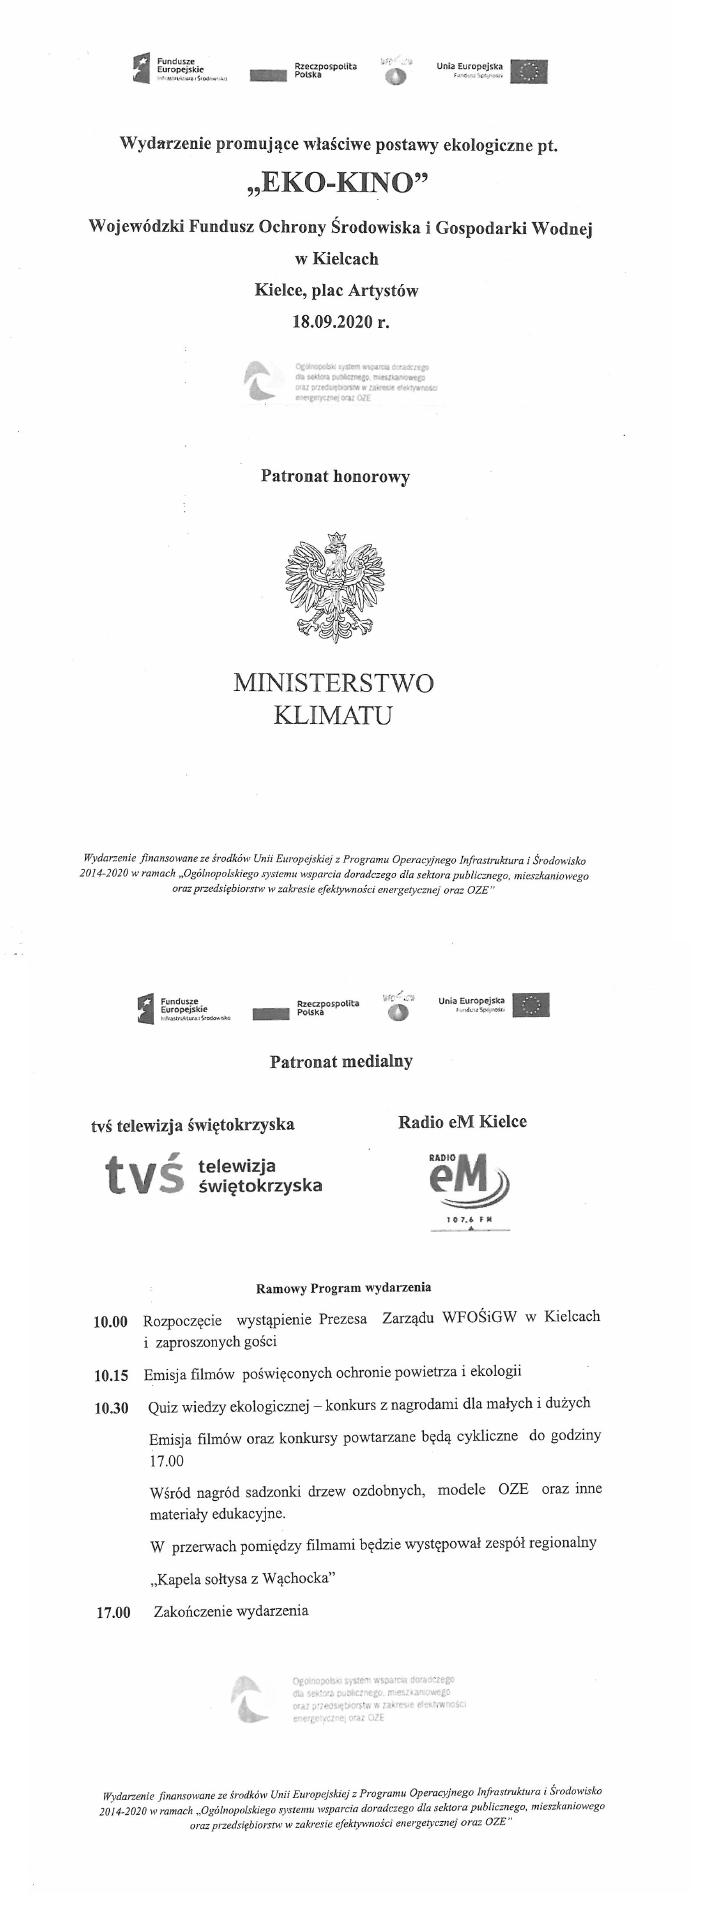 eko_kino.png